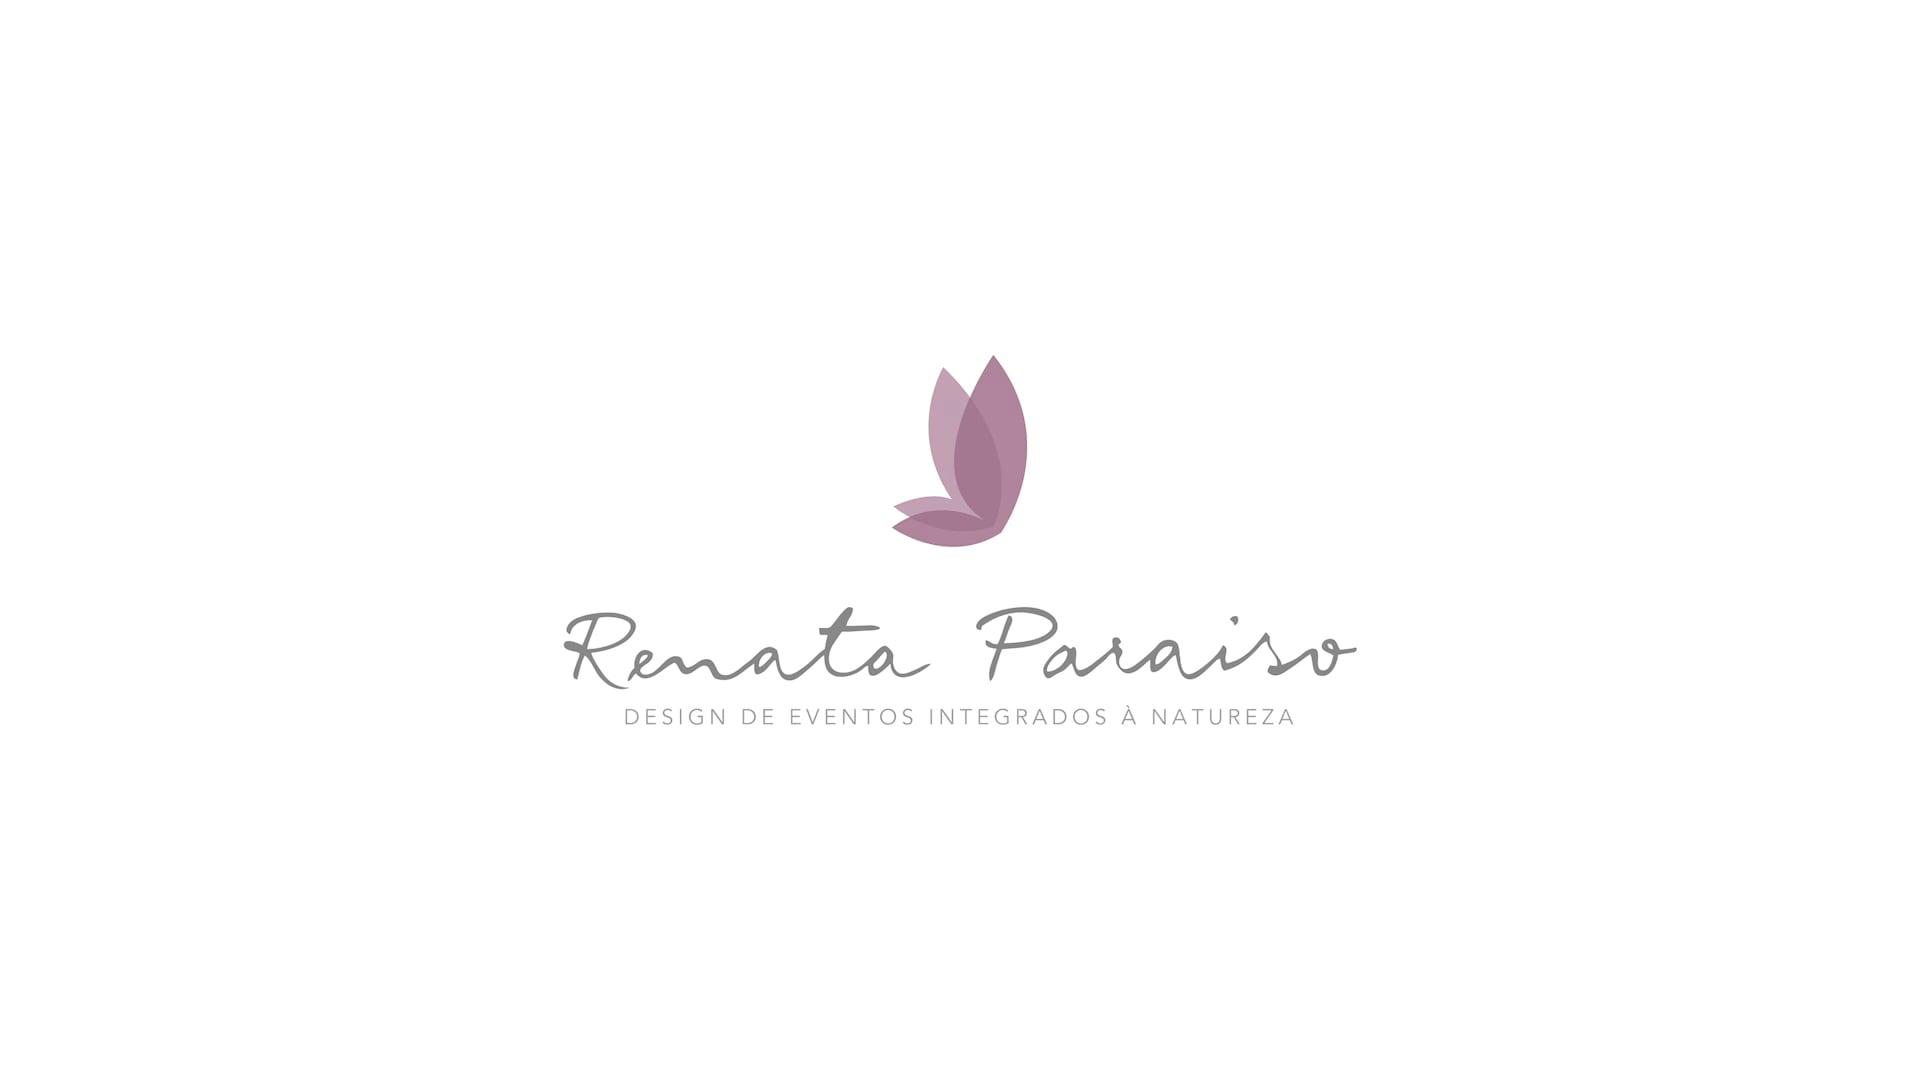 Workshop | Renata Paraiso | Graviola Filmes